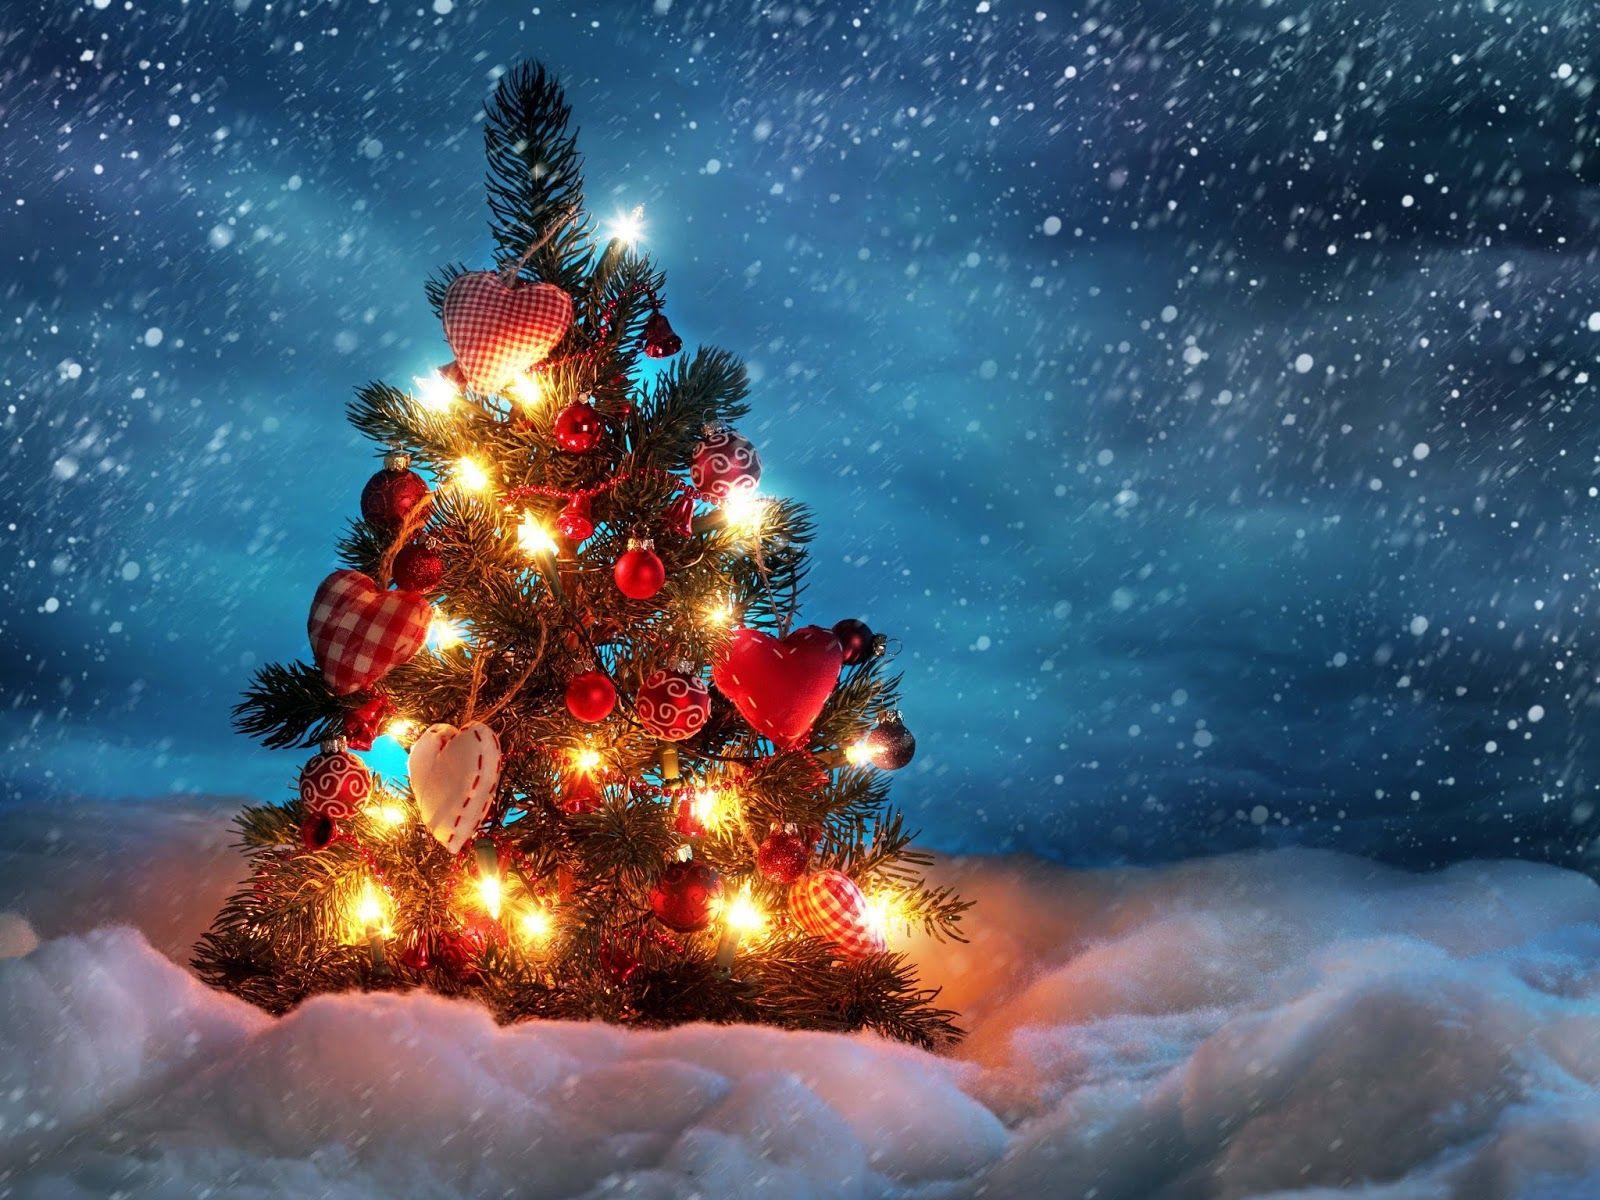 85 Beautiful Christmas Hd Wallpapers 2019 Christmas Tree Wallpaper Cute Christmas Tree Christmas Desktop Wallpaper